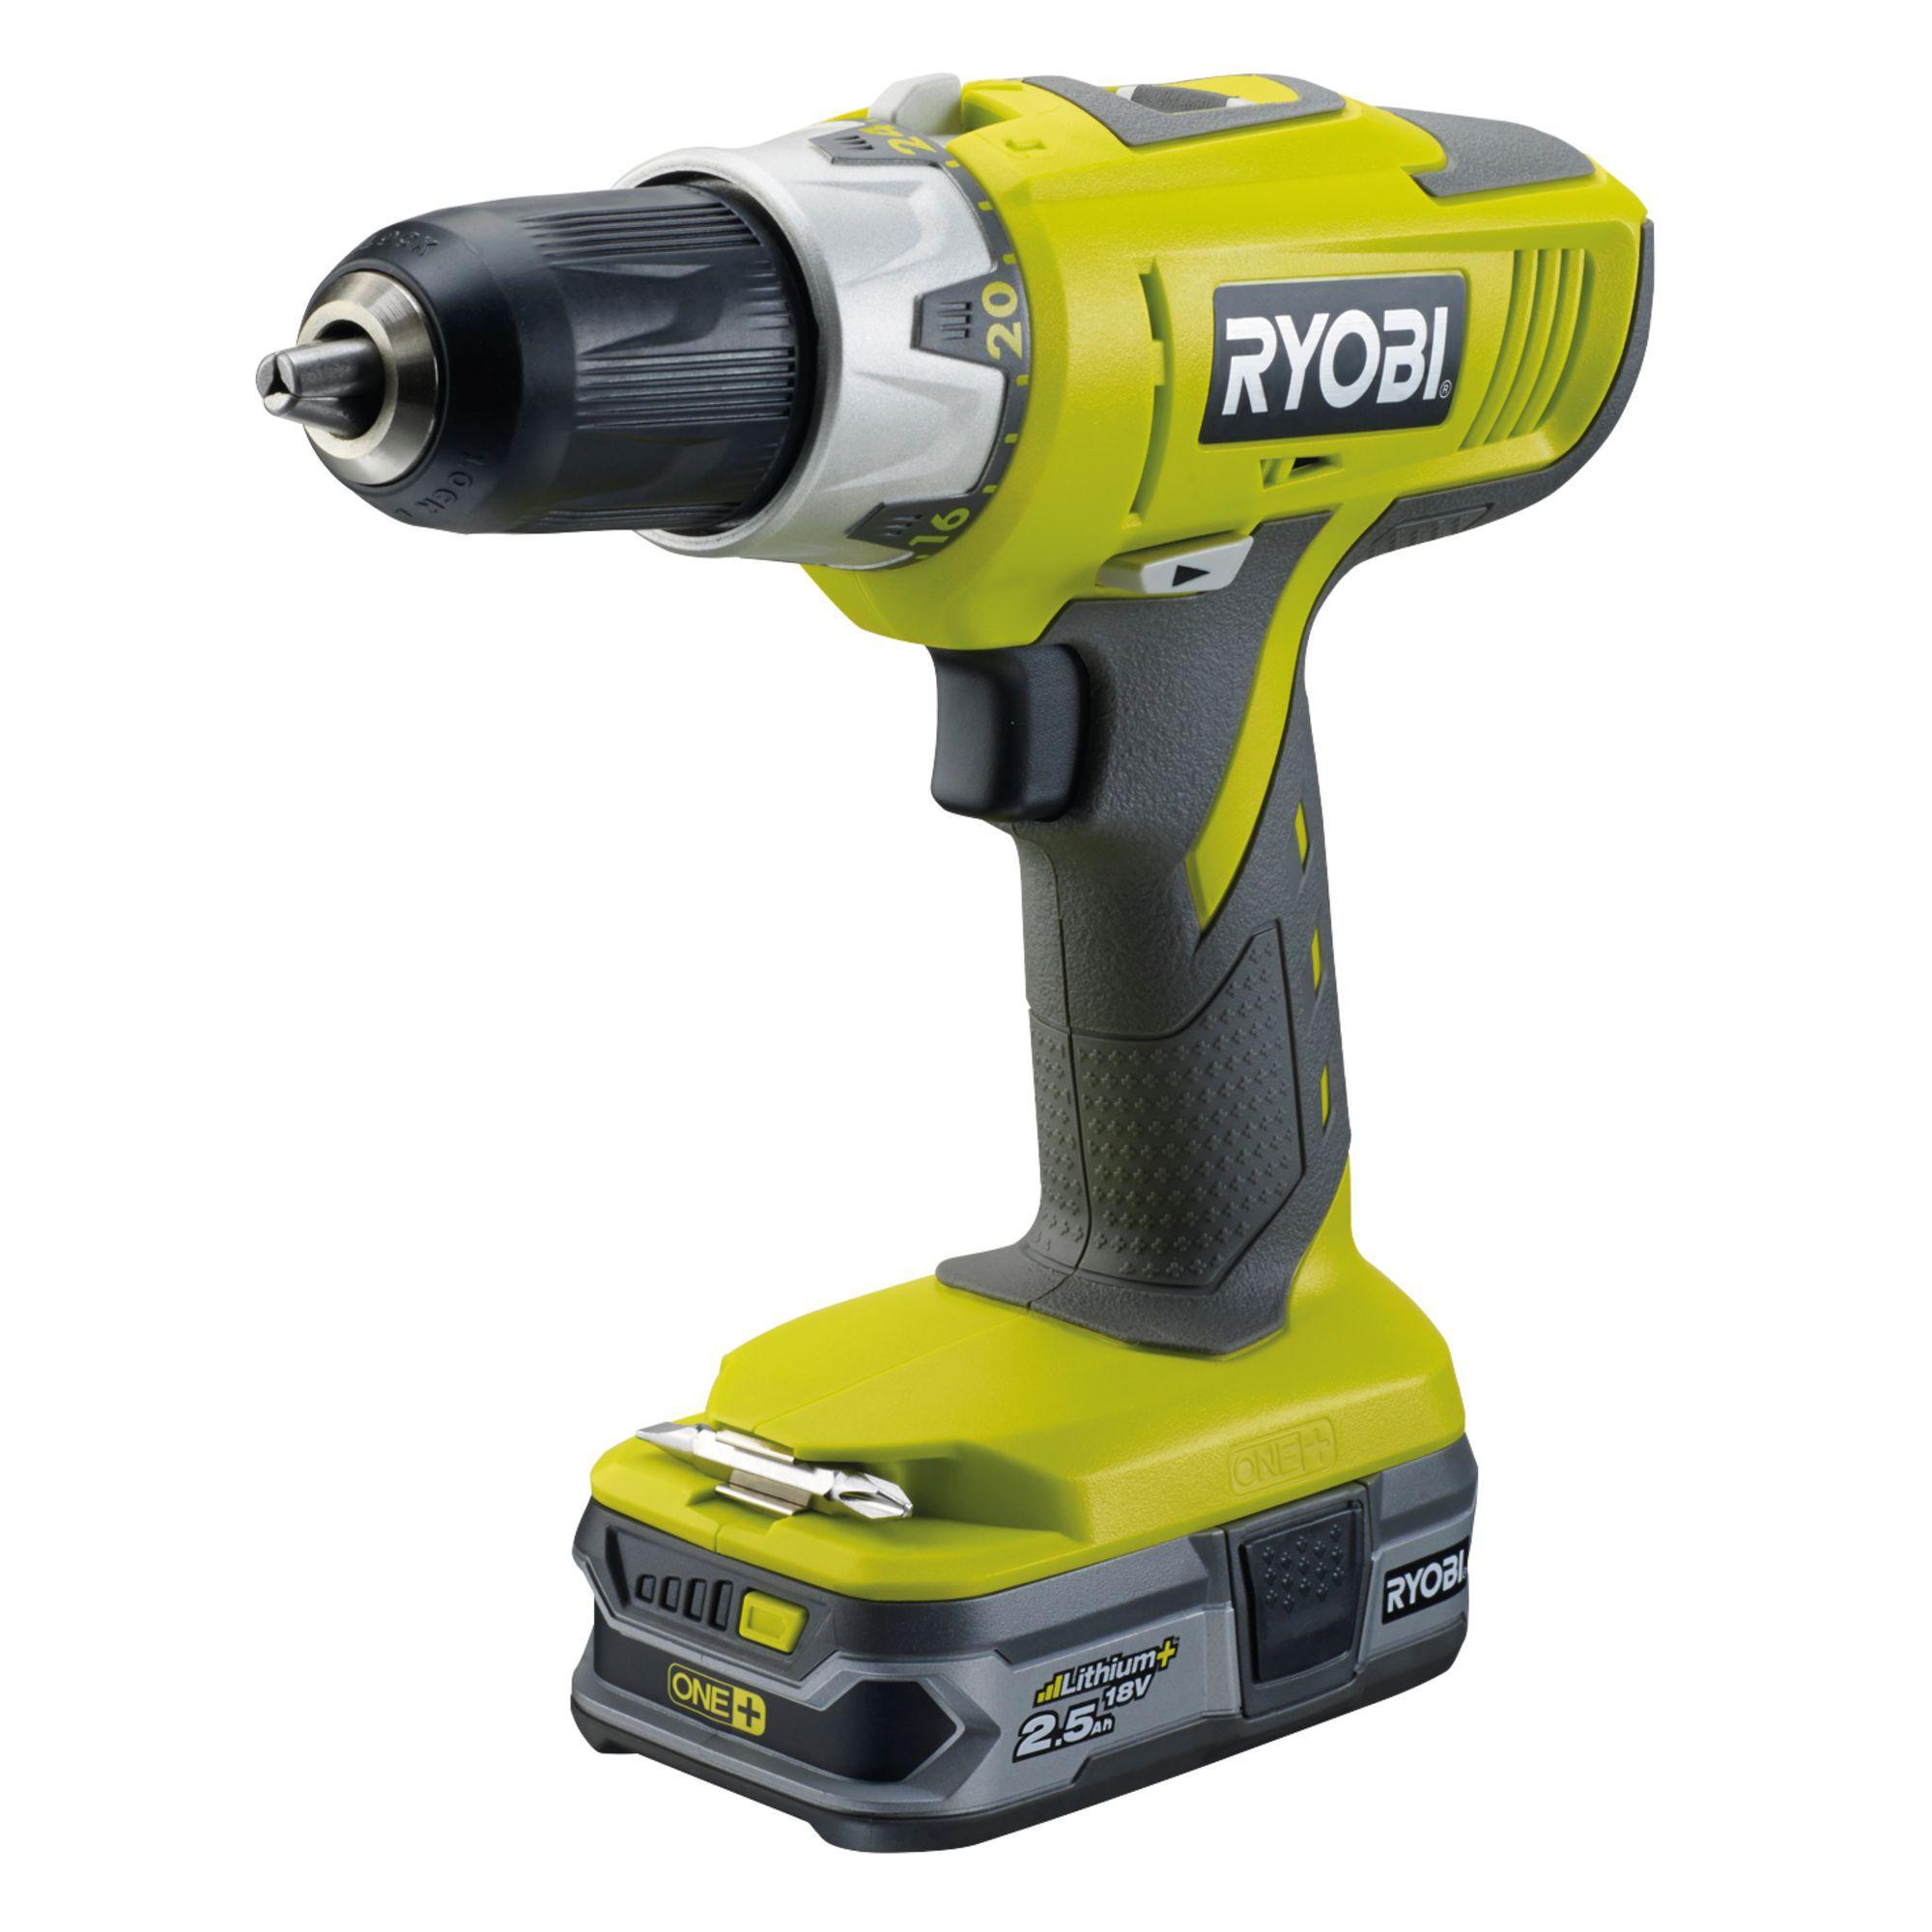 Ryobi One+ Cordless 18v 2.5ah Li-ion Combi Drill 2 Batteries Llcdi1802-ll25s